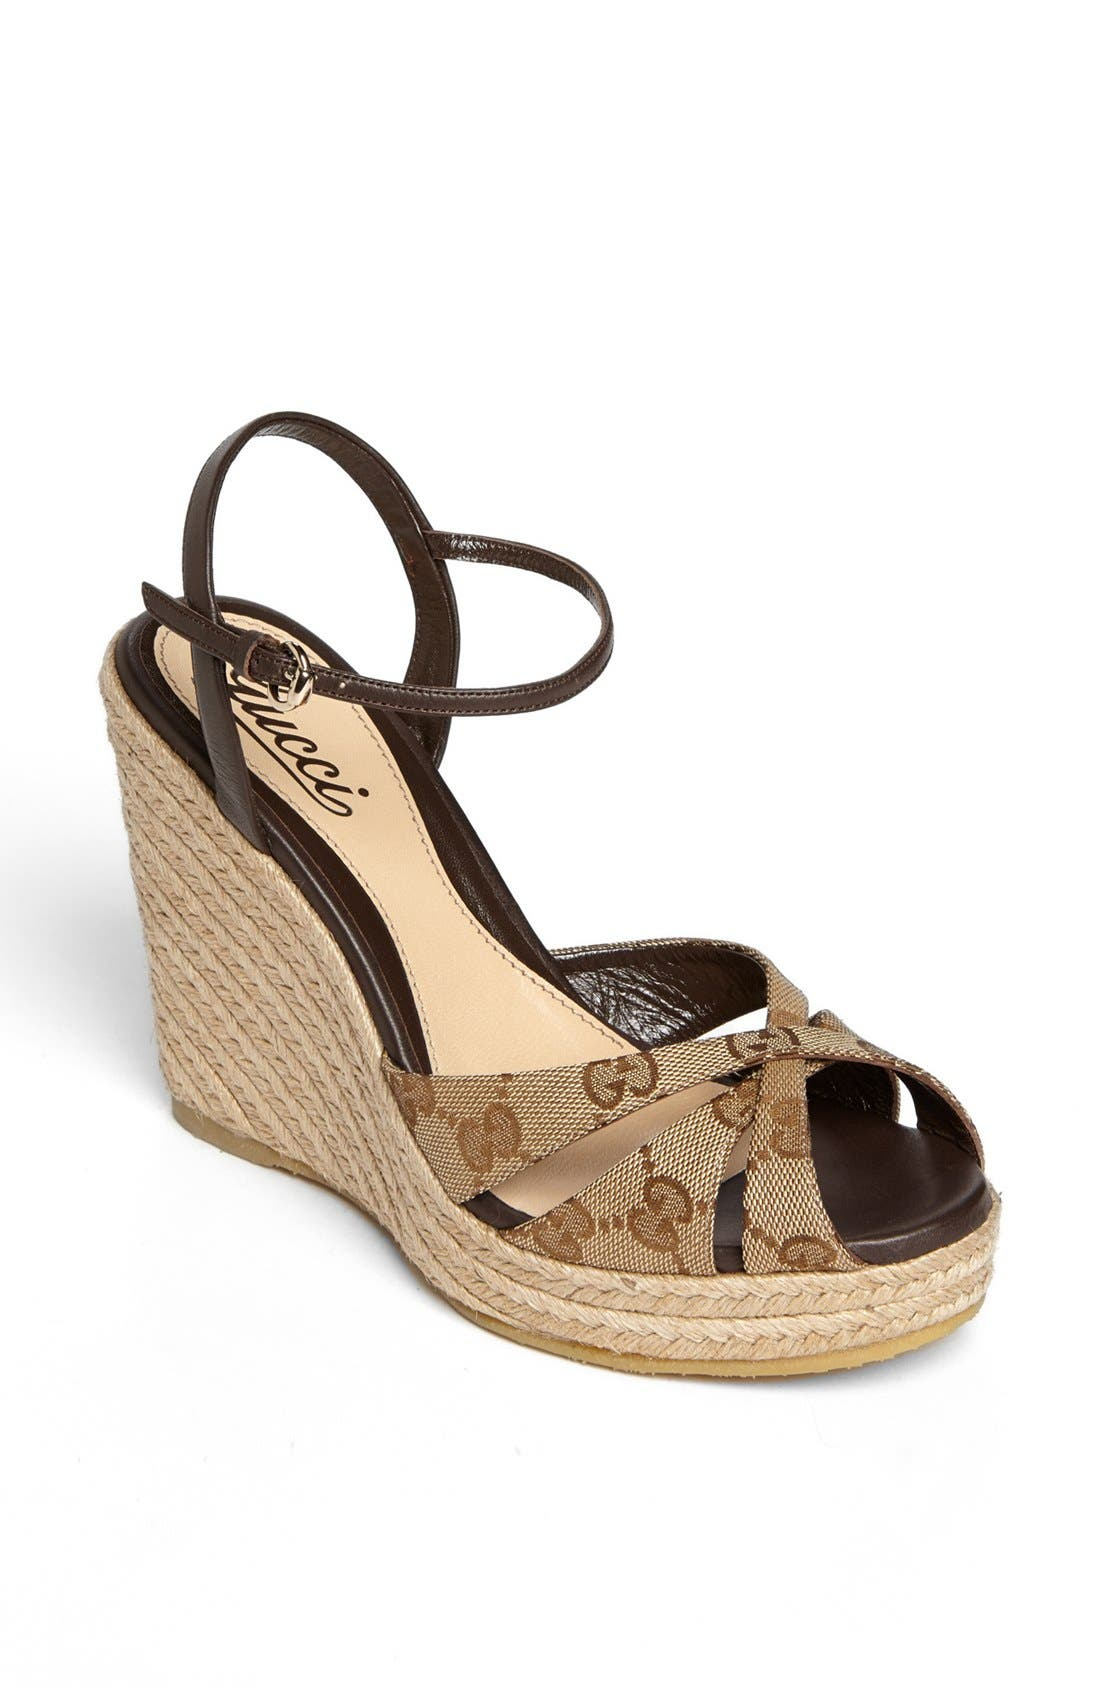 Alternate Image 1 Selected - Gucci 'Penelope' Espadrille Sandal